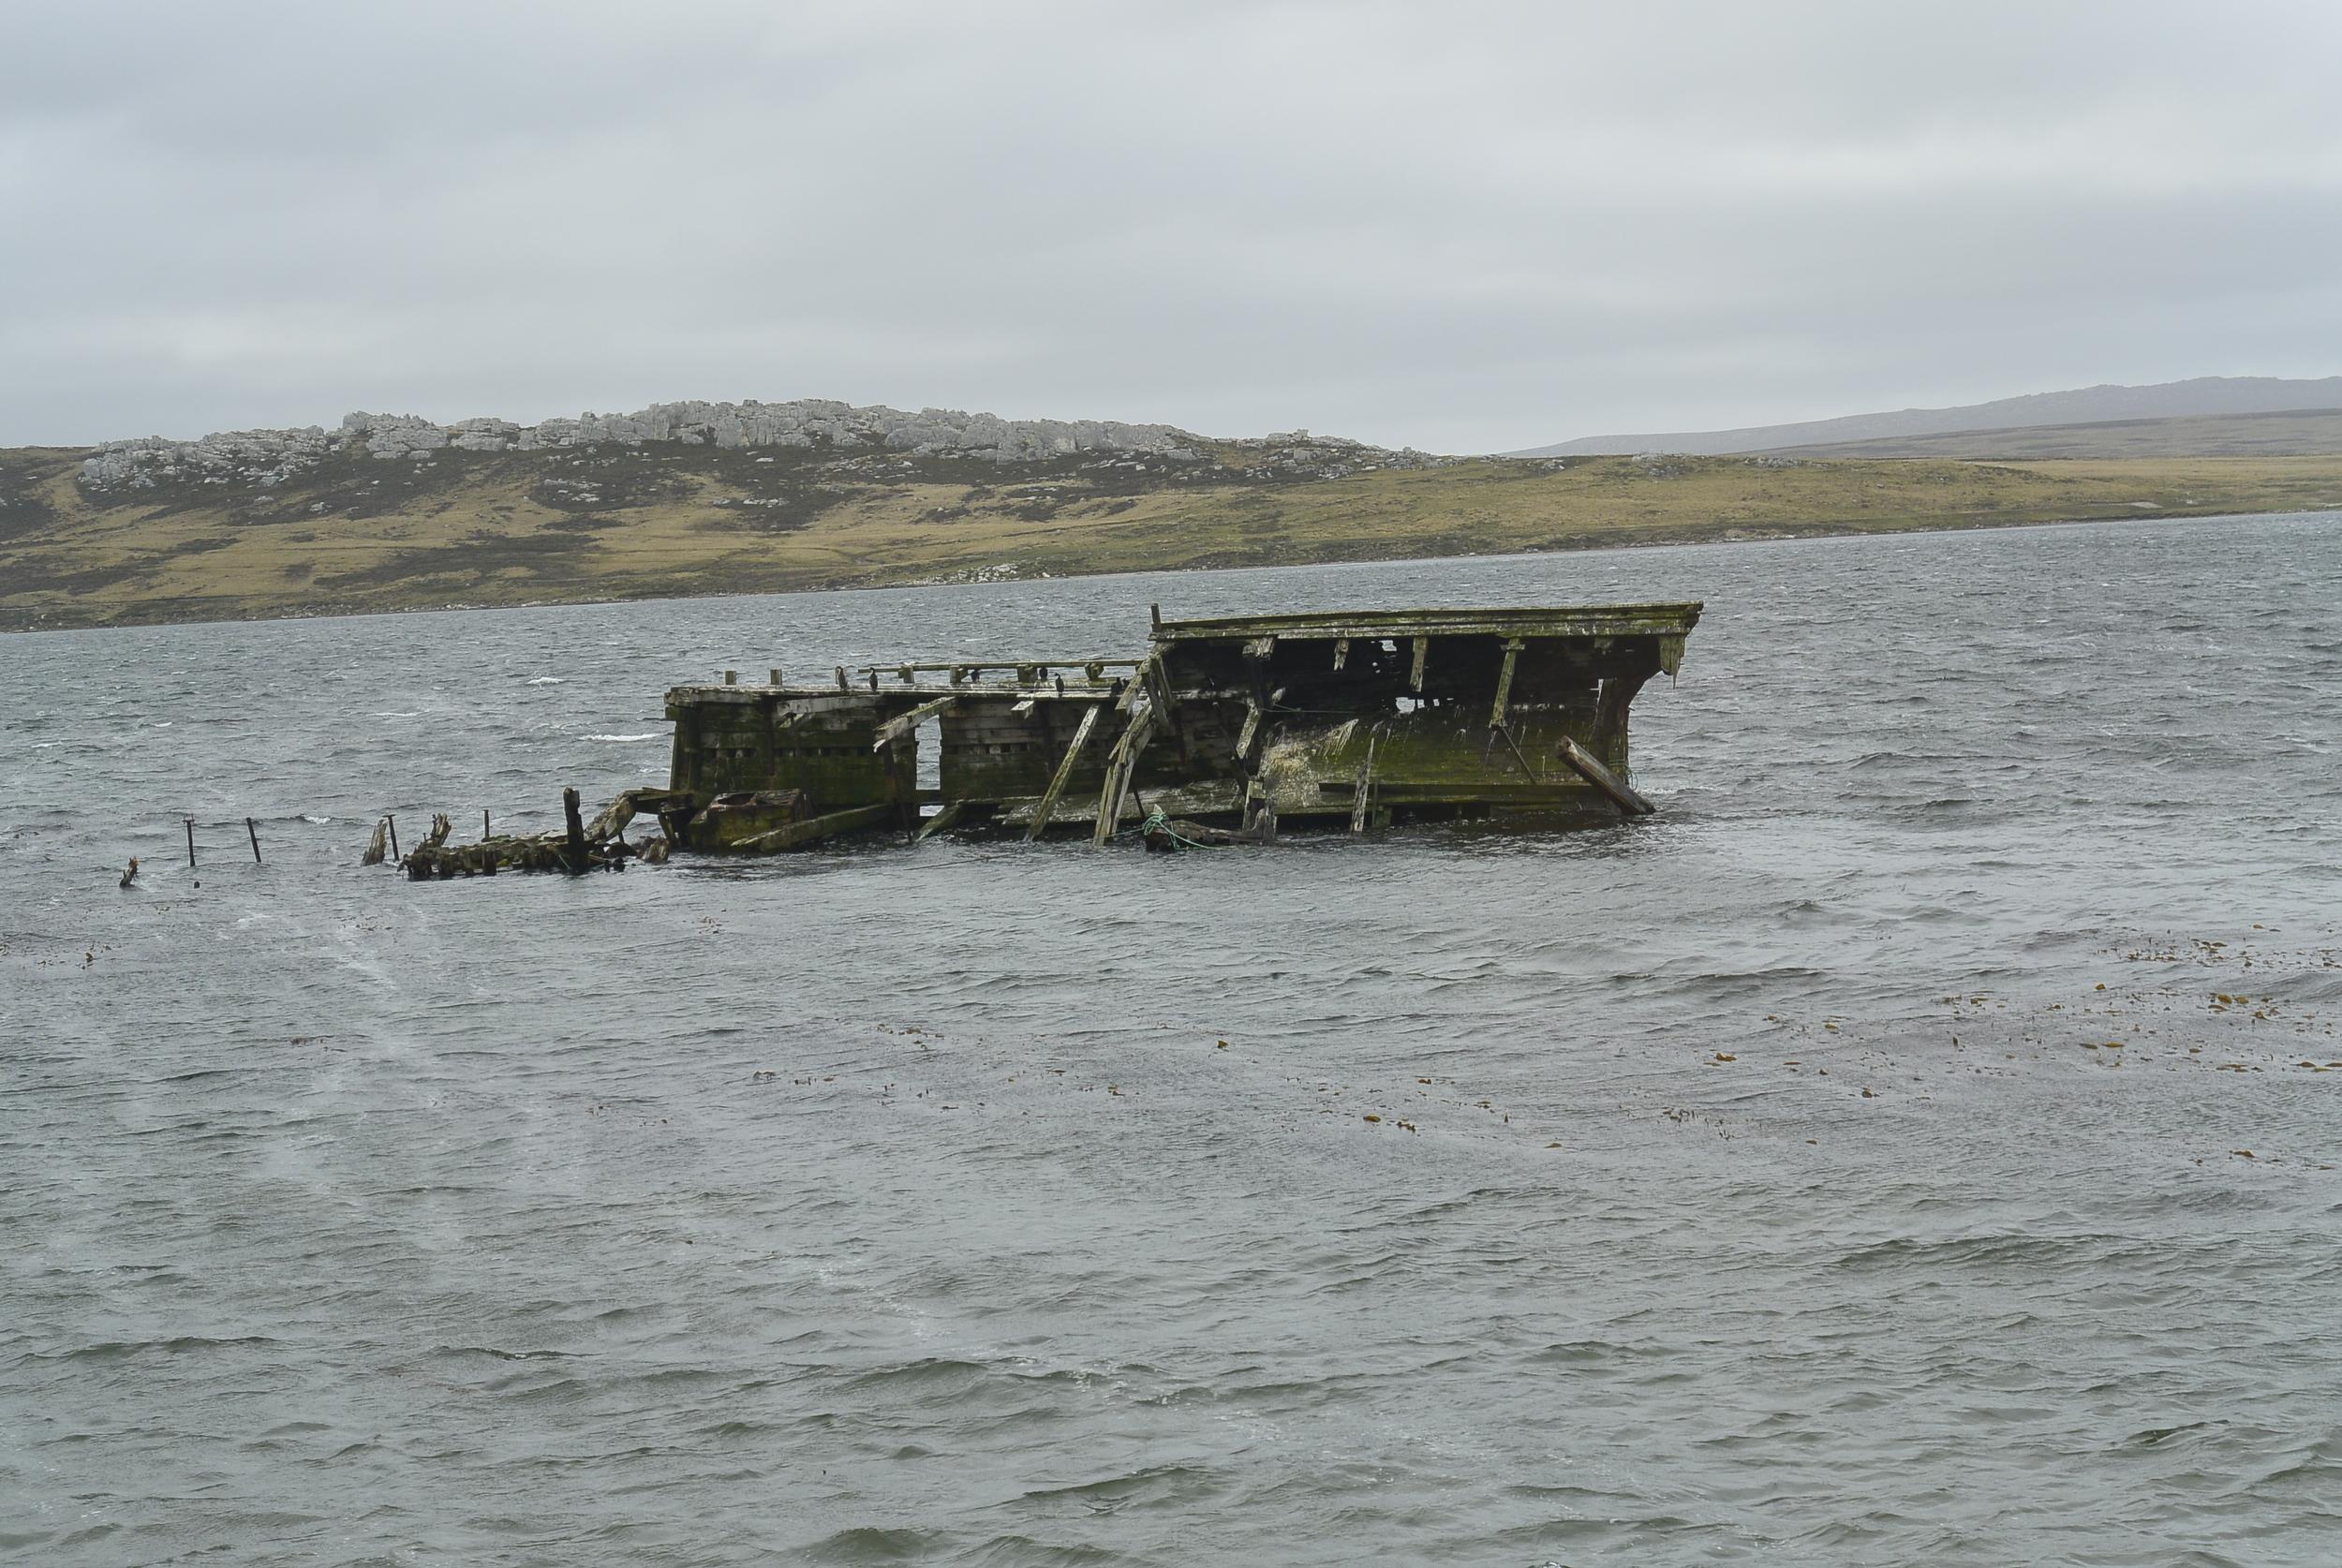 Shipwreck Falkland Islands